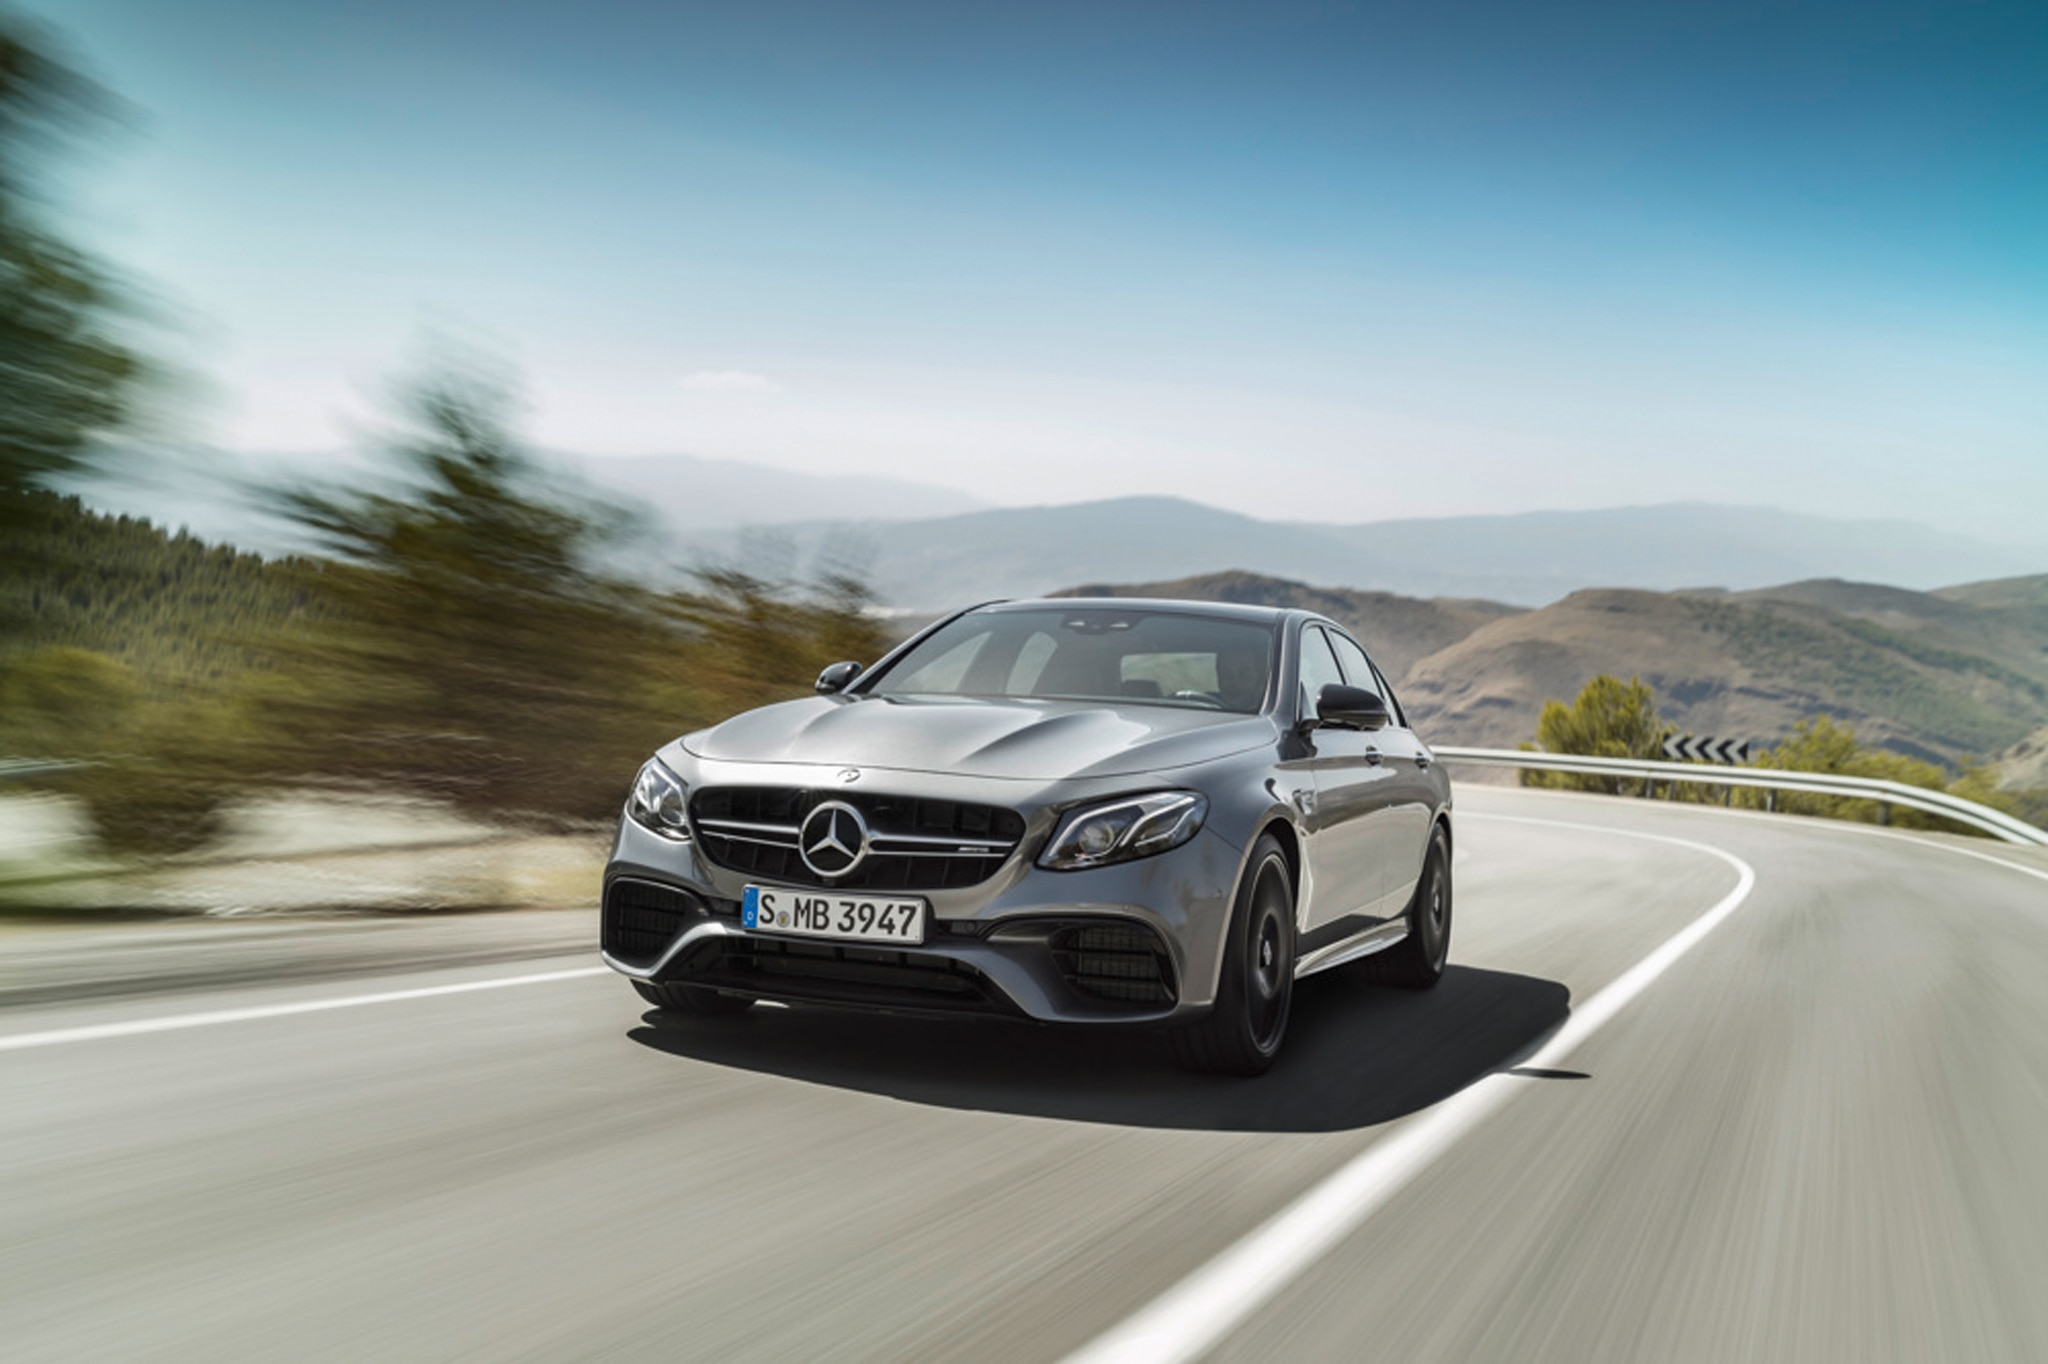 2018 Mercedes AMG_E_63s Road Front Curve